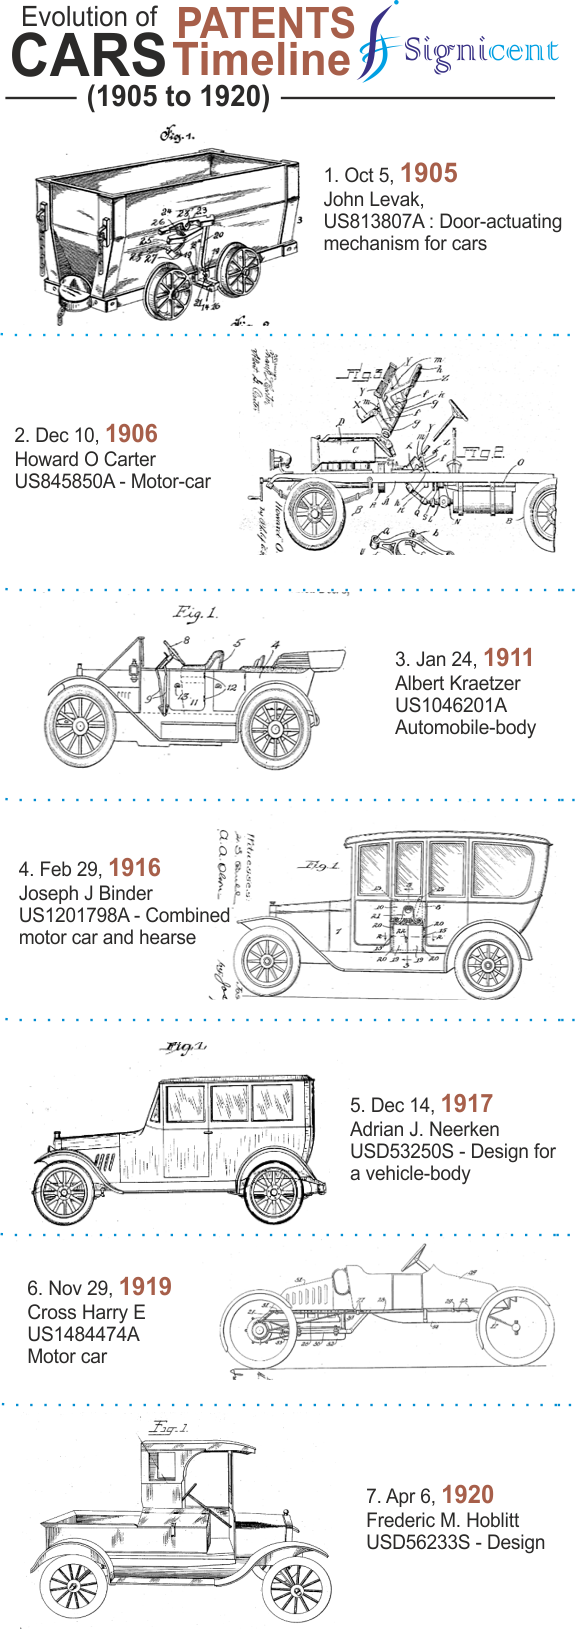 Patents Timeline Cars blog 1 Signicent